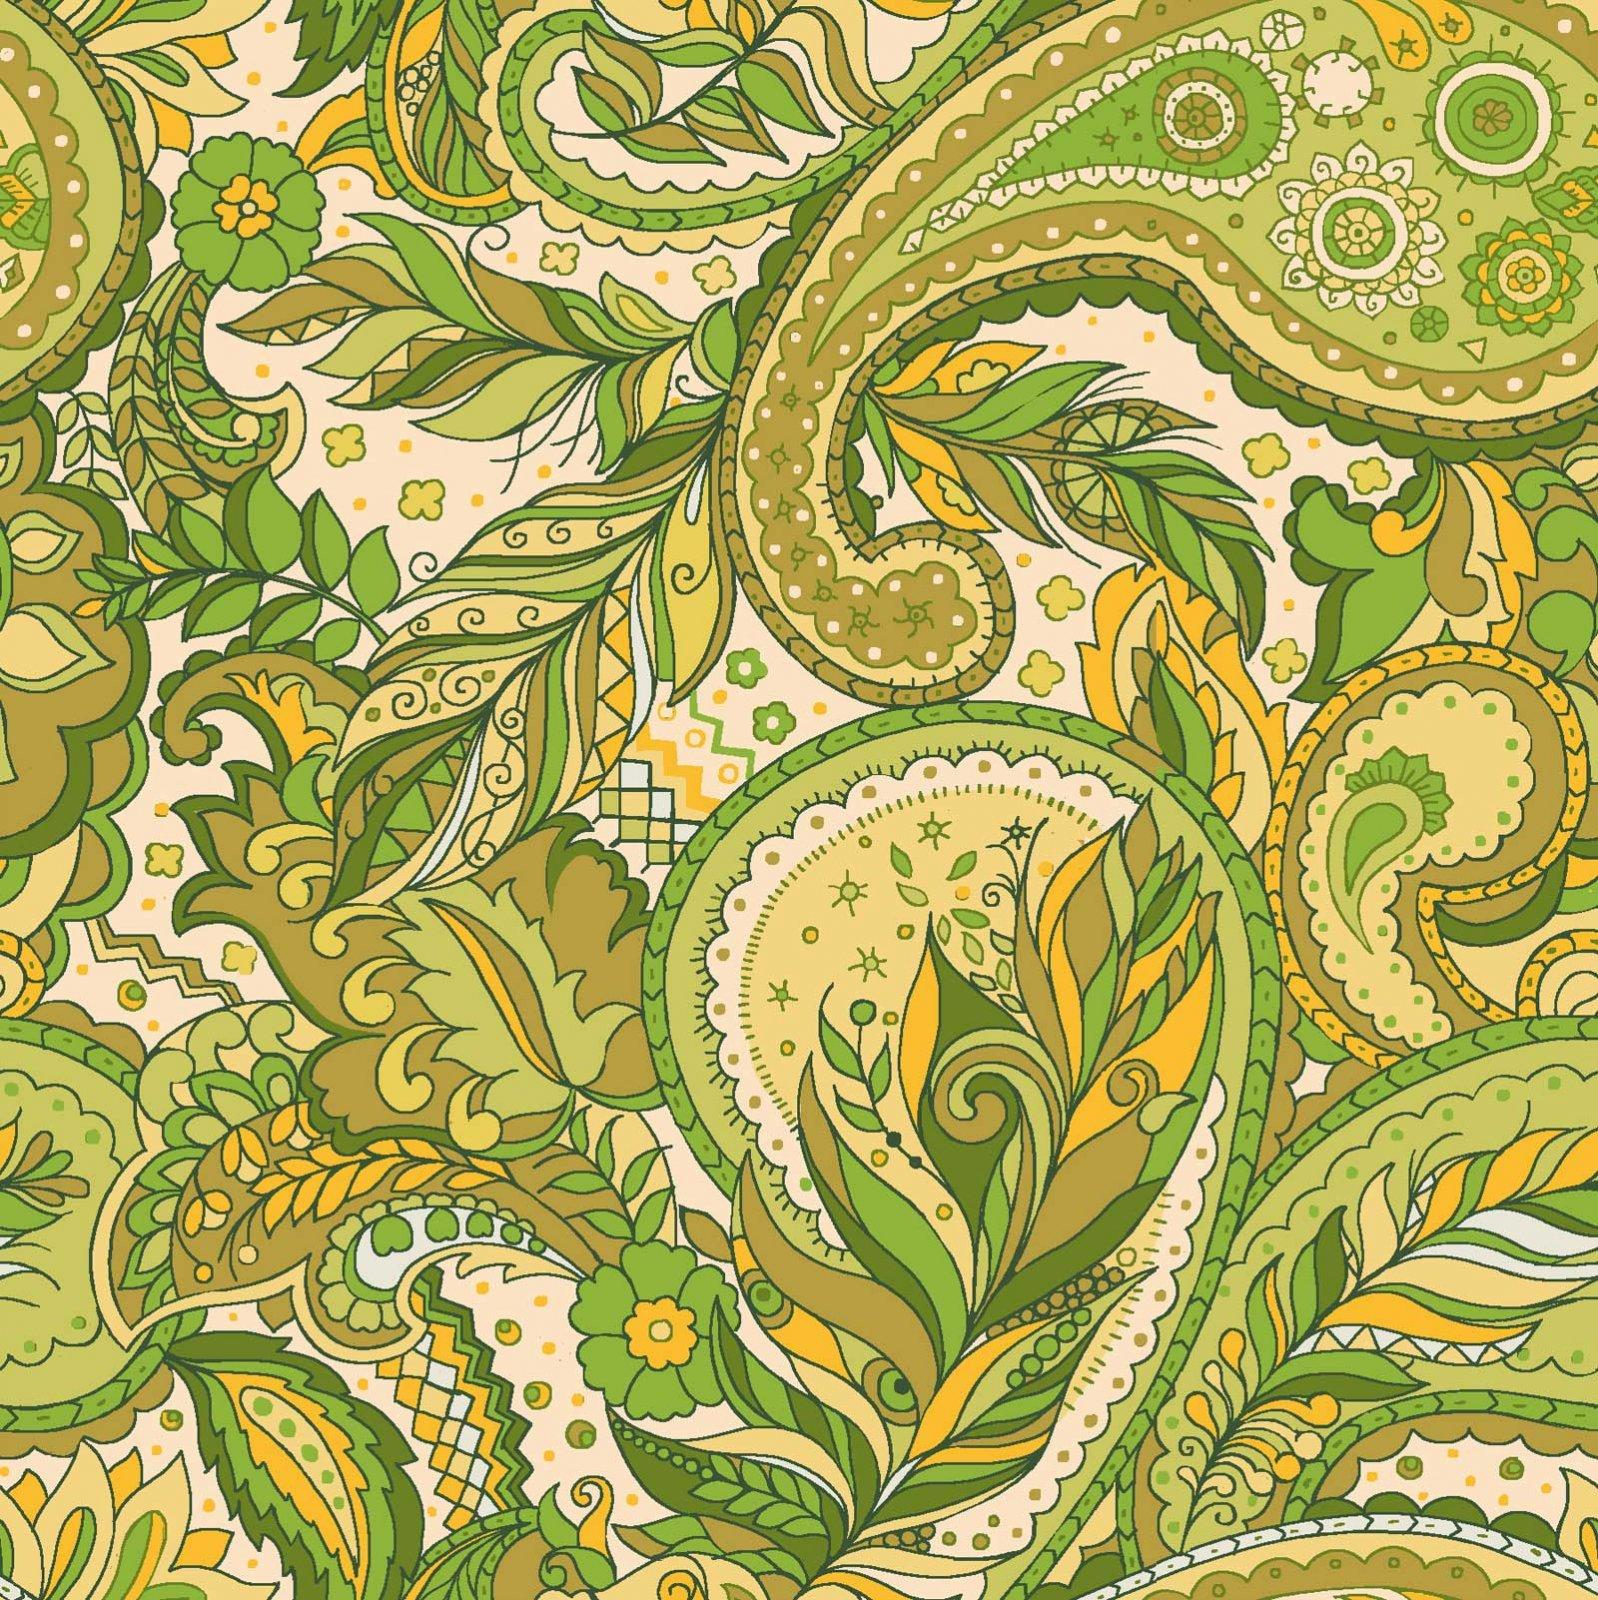 16602 BoHo Chic, Green Paisley'